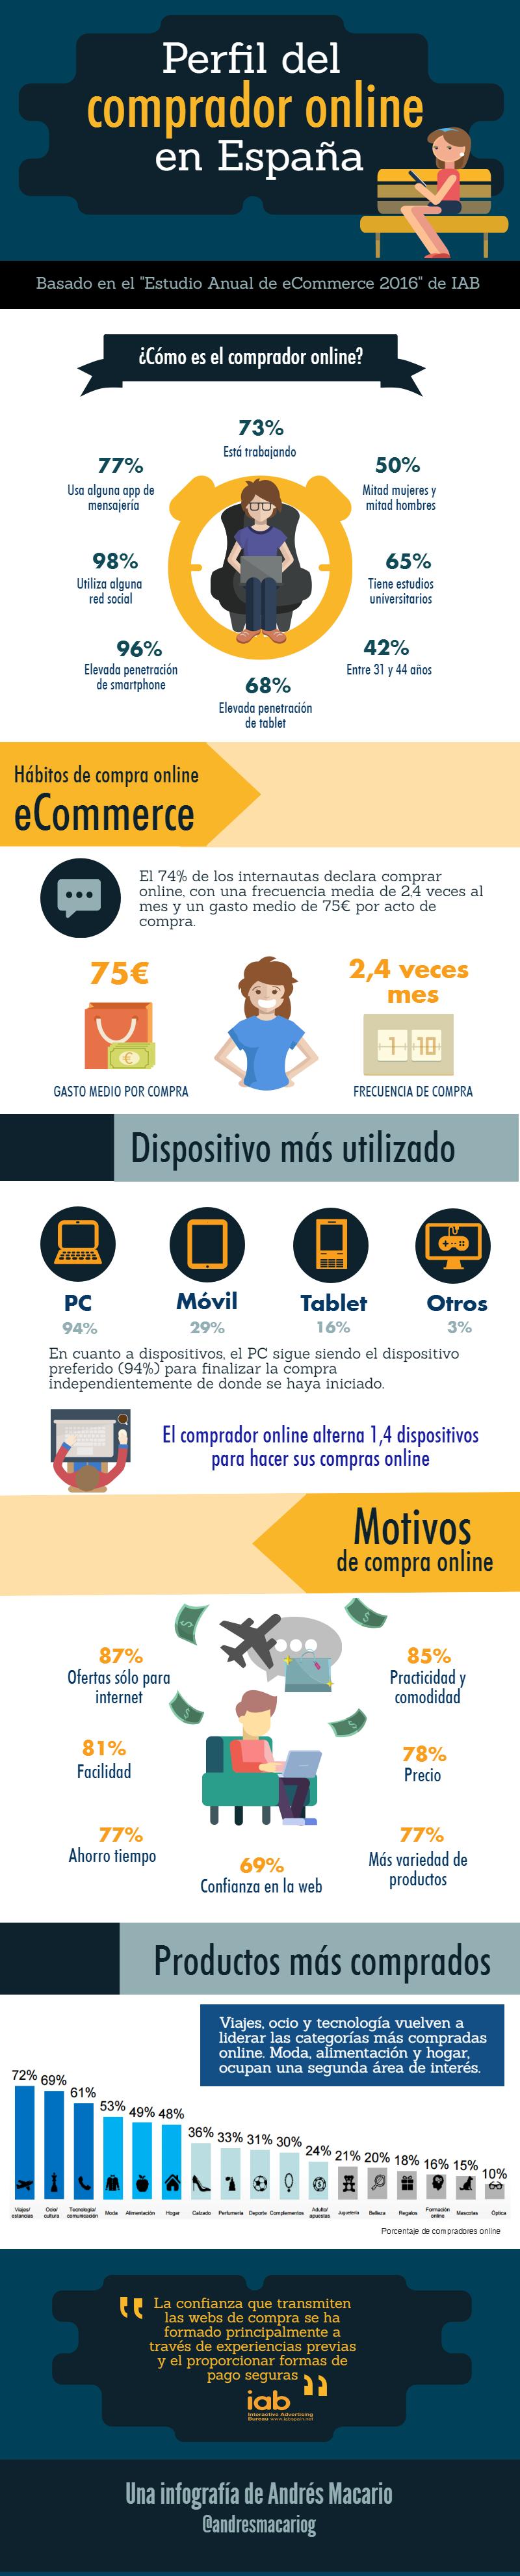 Perfil del comprador online España - Infografia Andres Macario